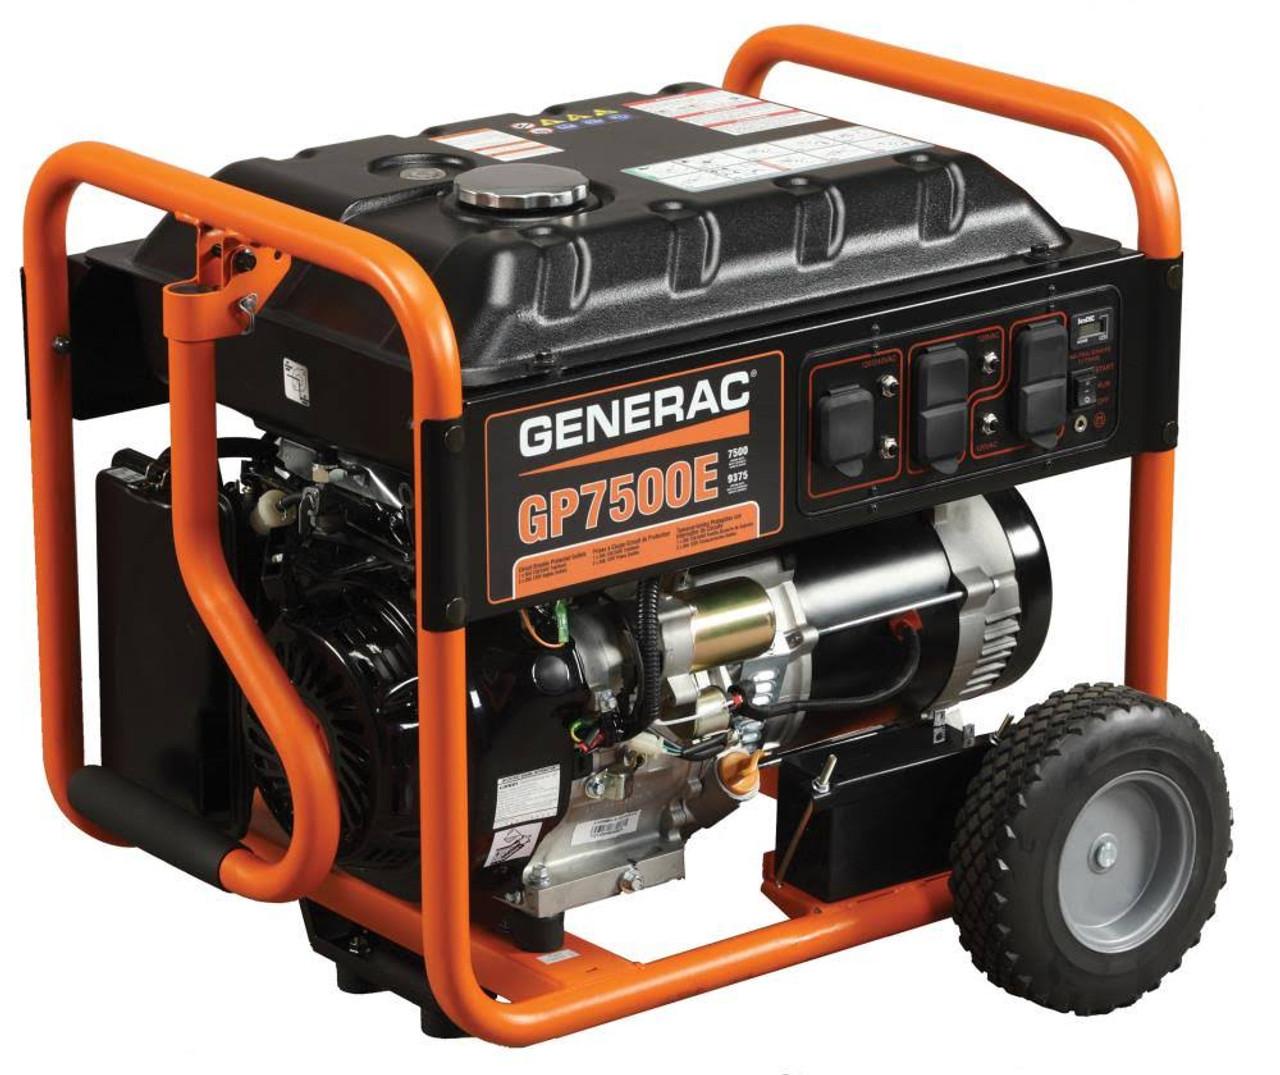 generac 5943 7500 running watts gas powered portable generator carb compliant [ 1000 x 840 Pixel ]